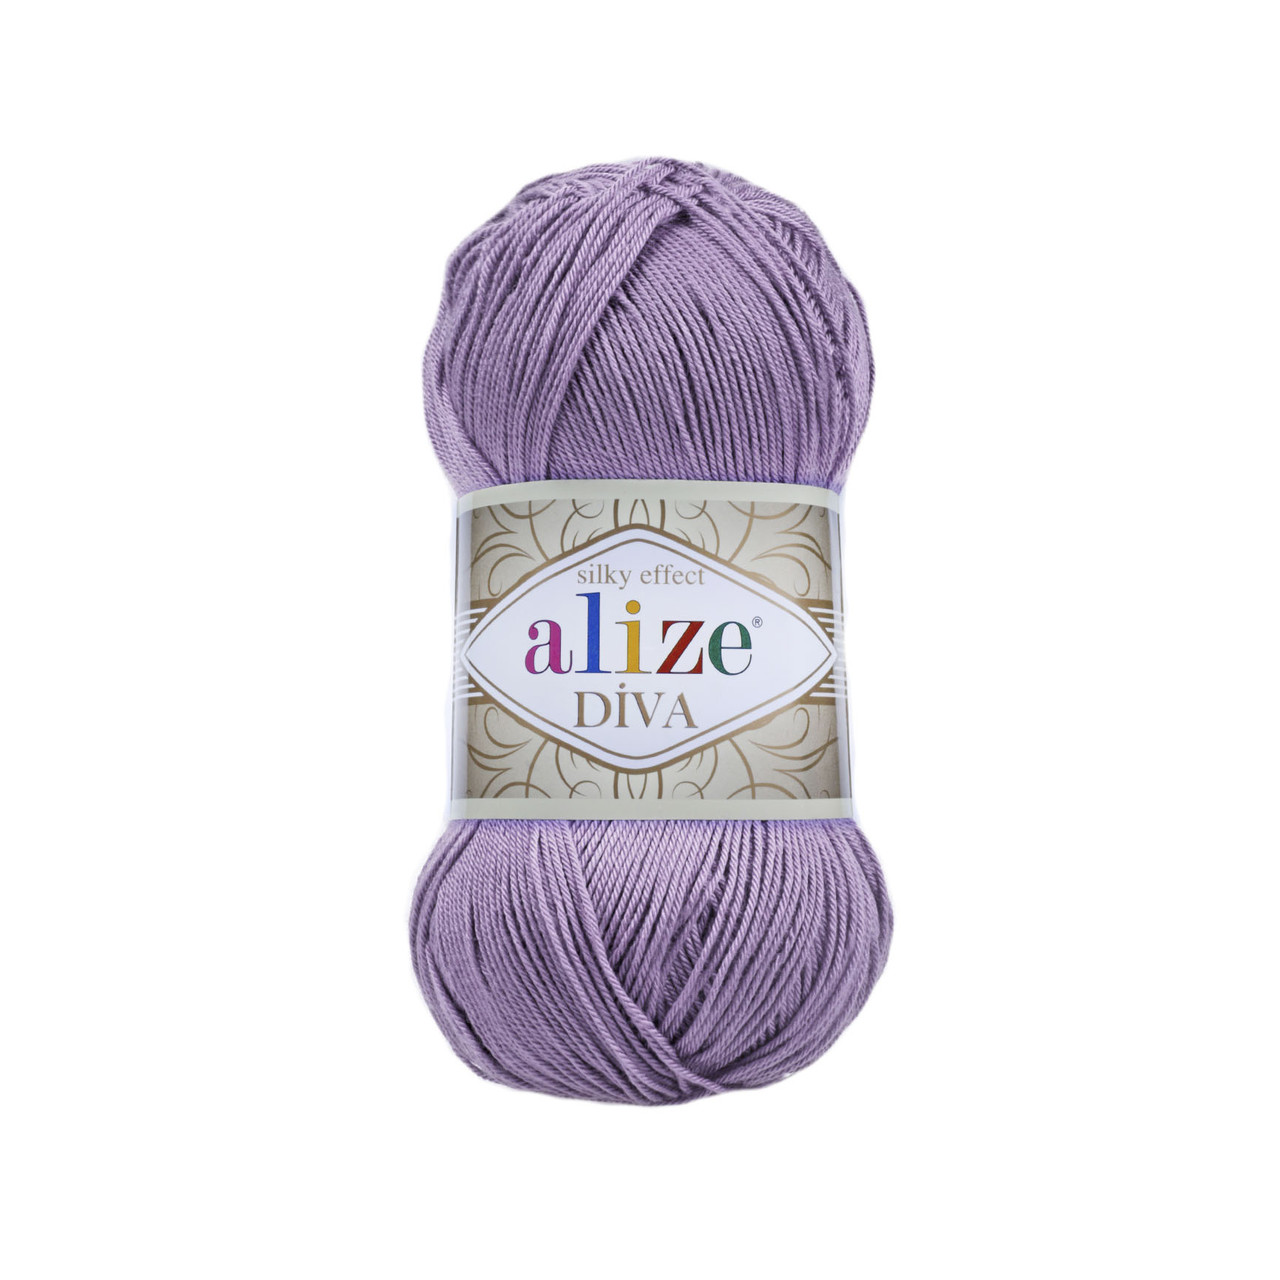 Пряжа Ализе Дива Alize Diva, цвет №622 фиолетовый